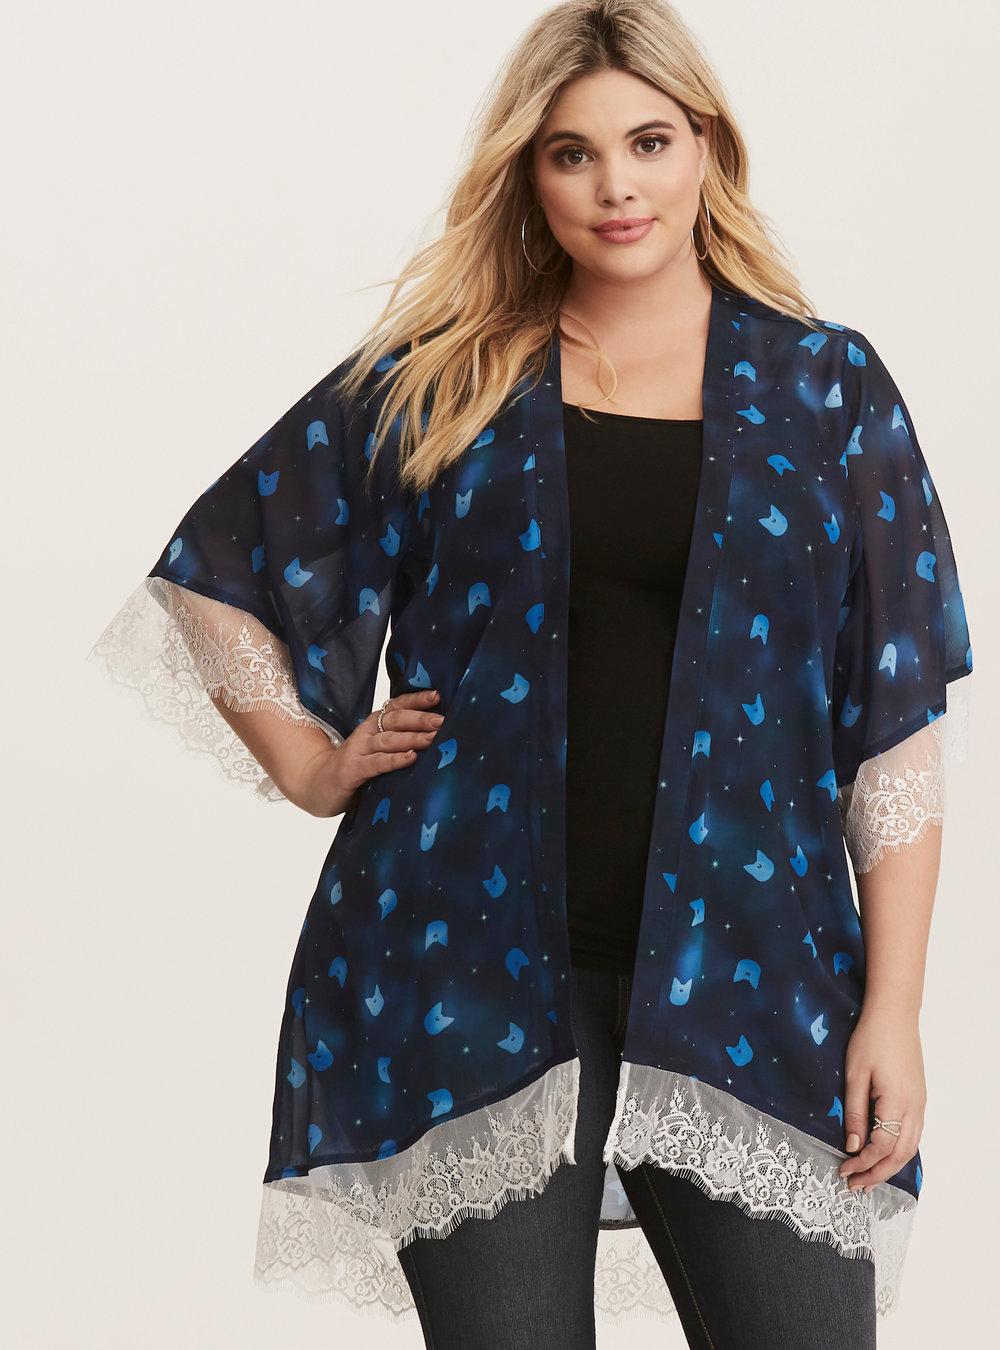 Kimono. Photo credit: Torrid